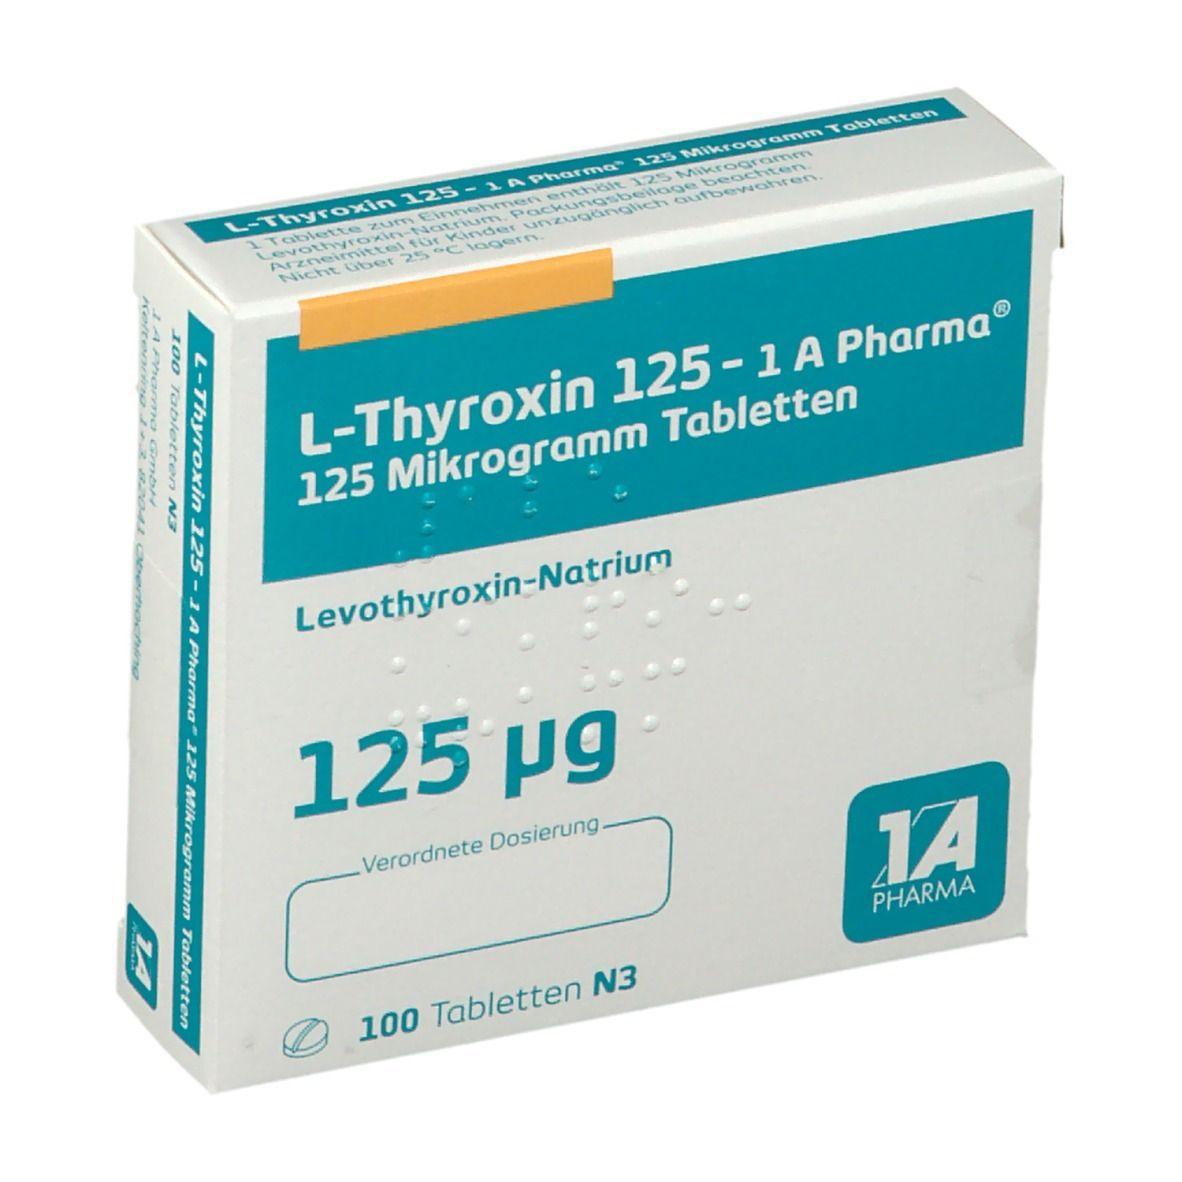 L Thyroxin 125 Gewichtszunahme